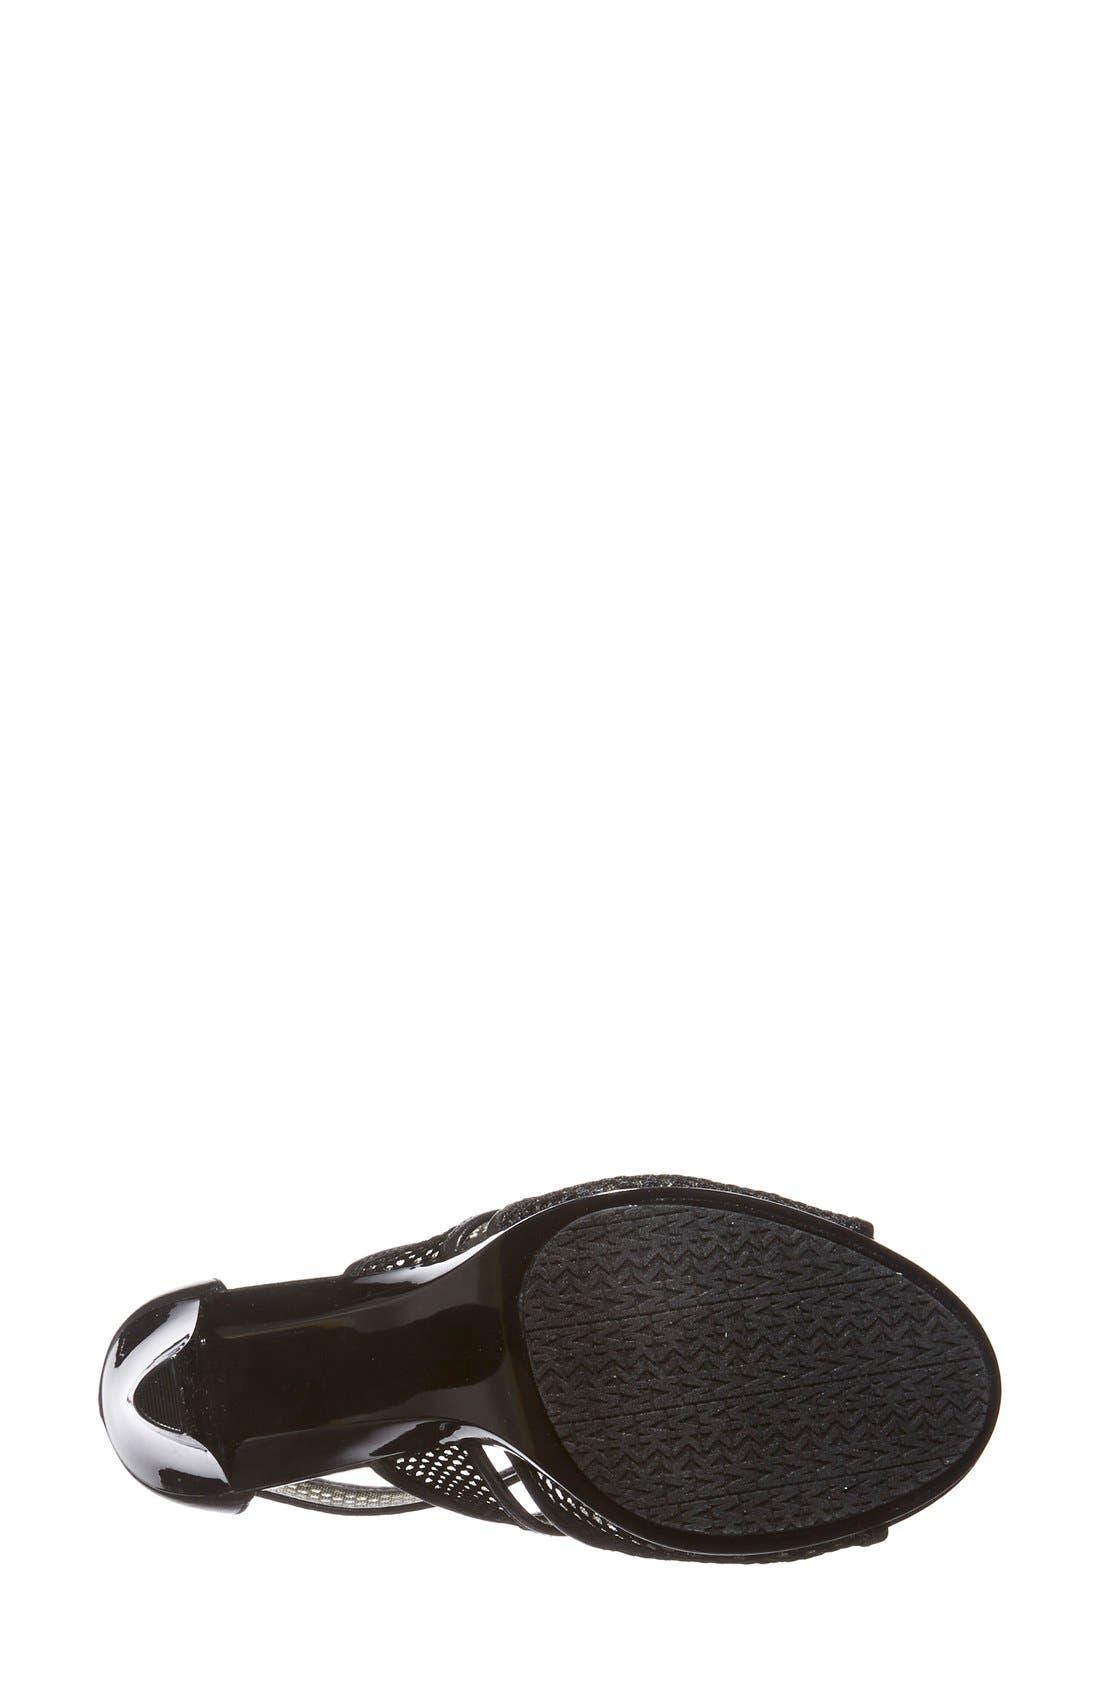 'Berkley' T-Strap Sandal,                             Alternate thumbnail 25, color,